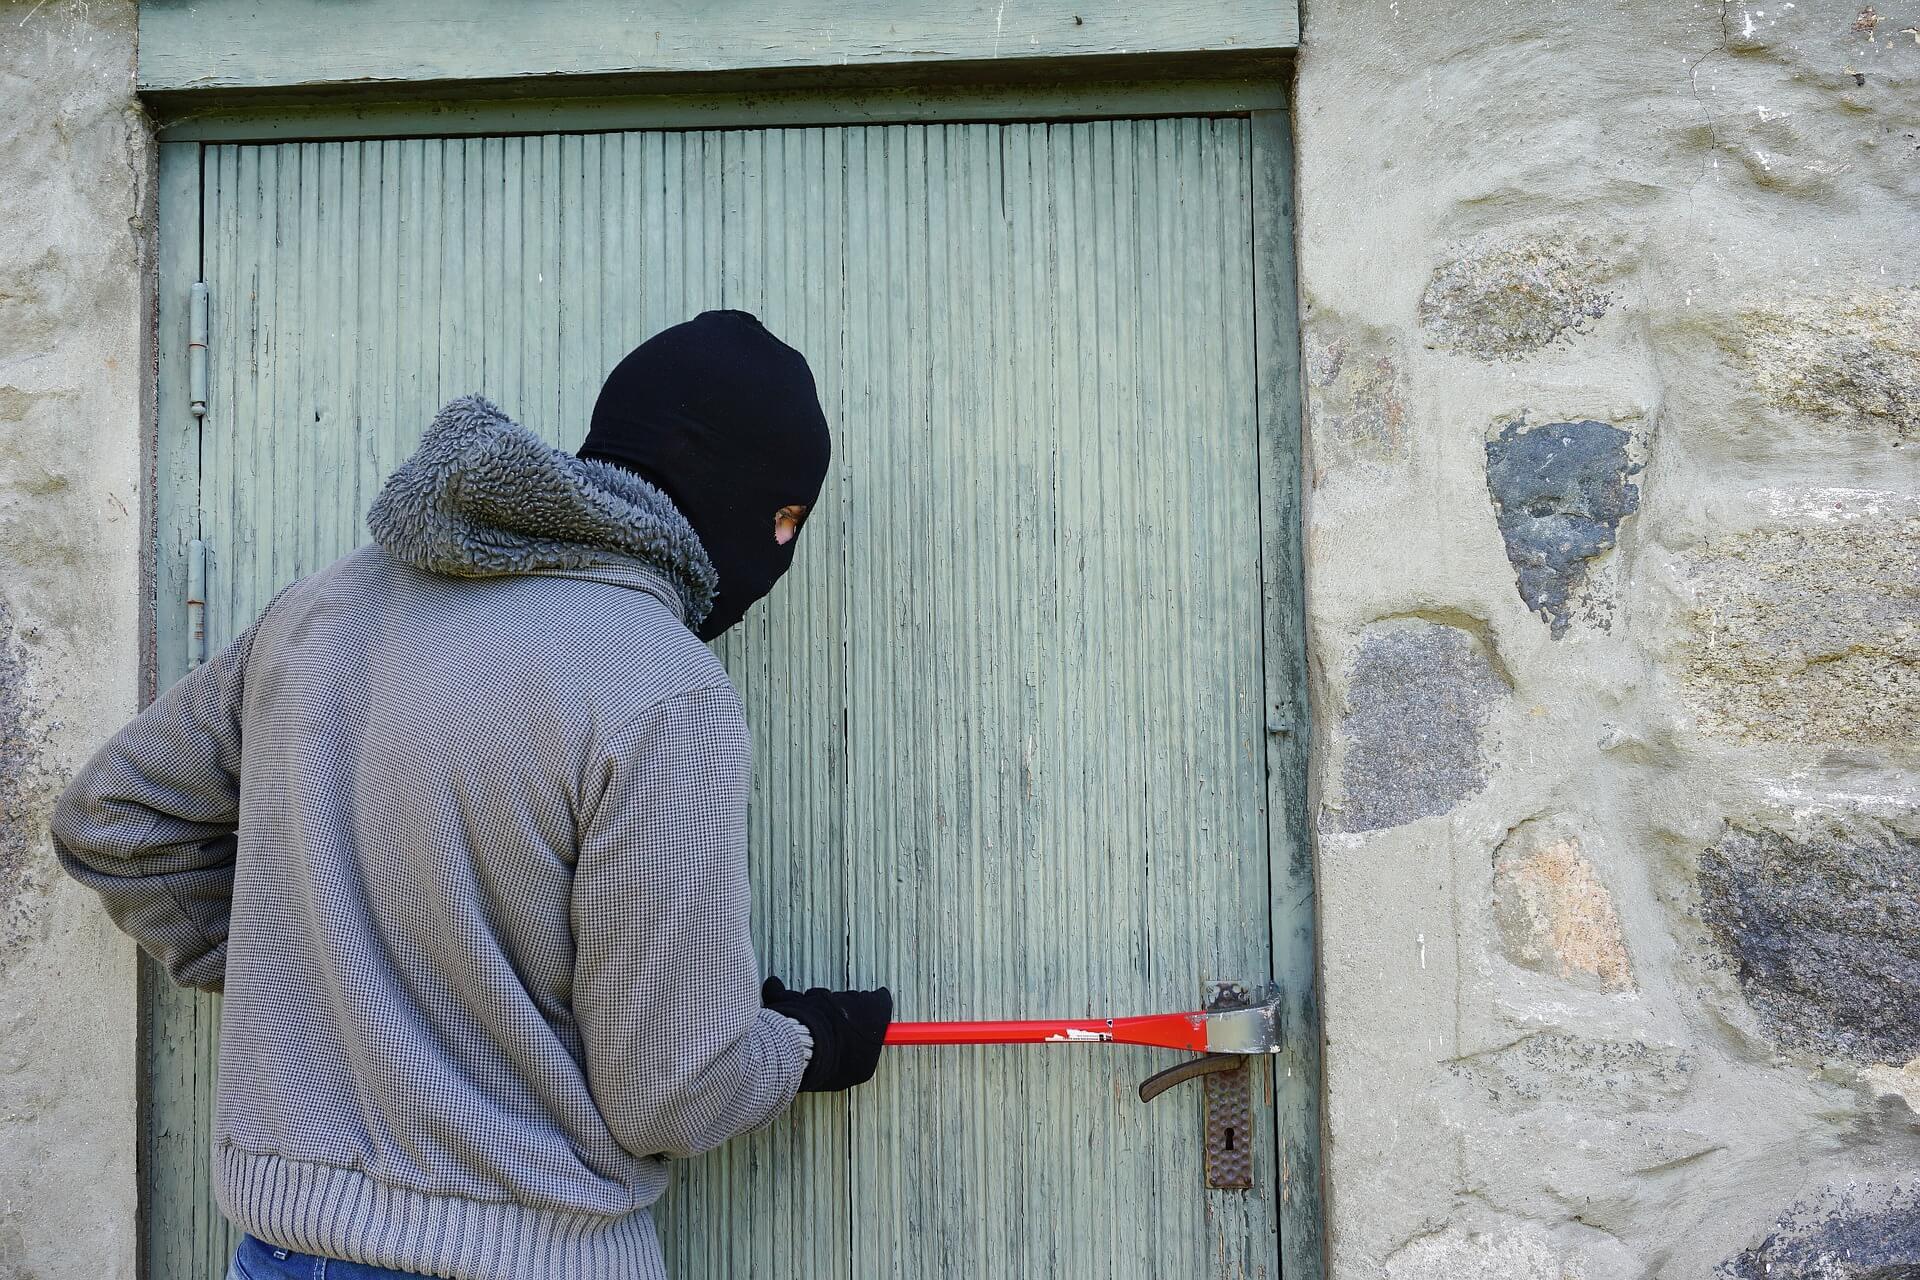 burglar breaking lock with crowbar